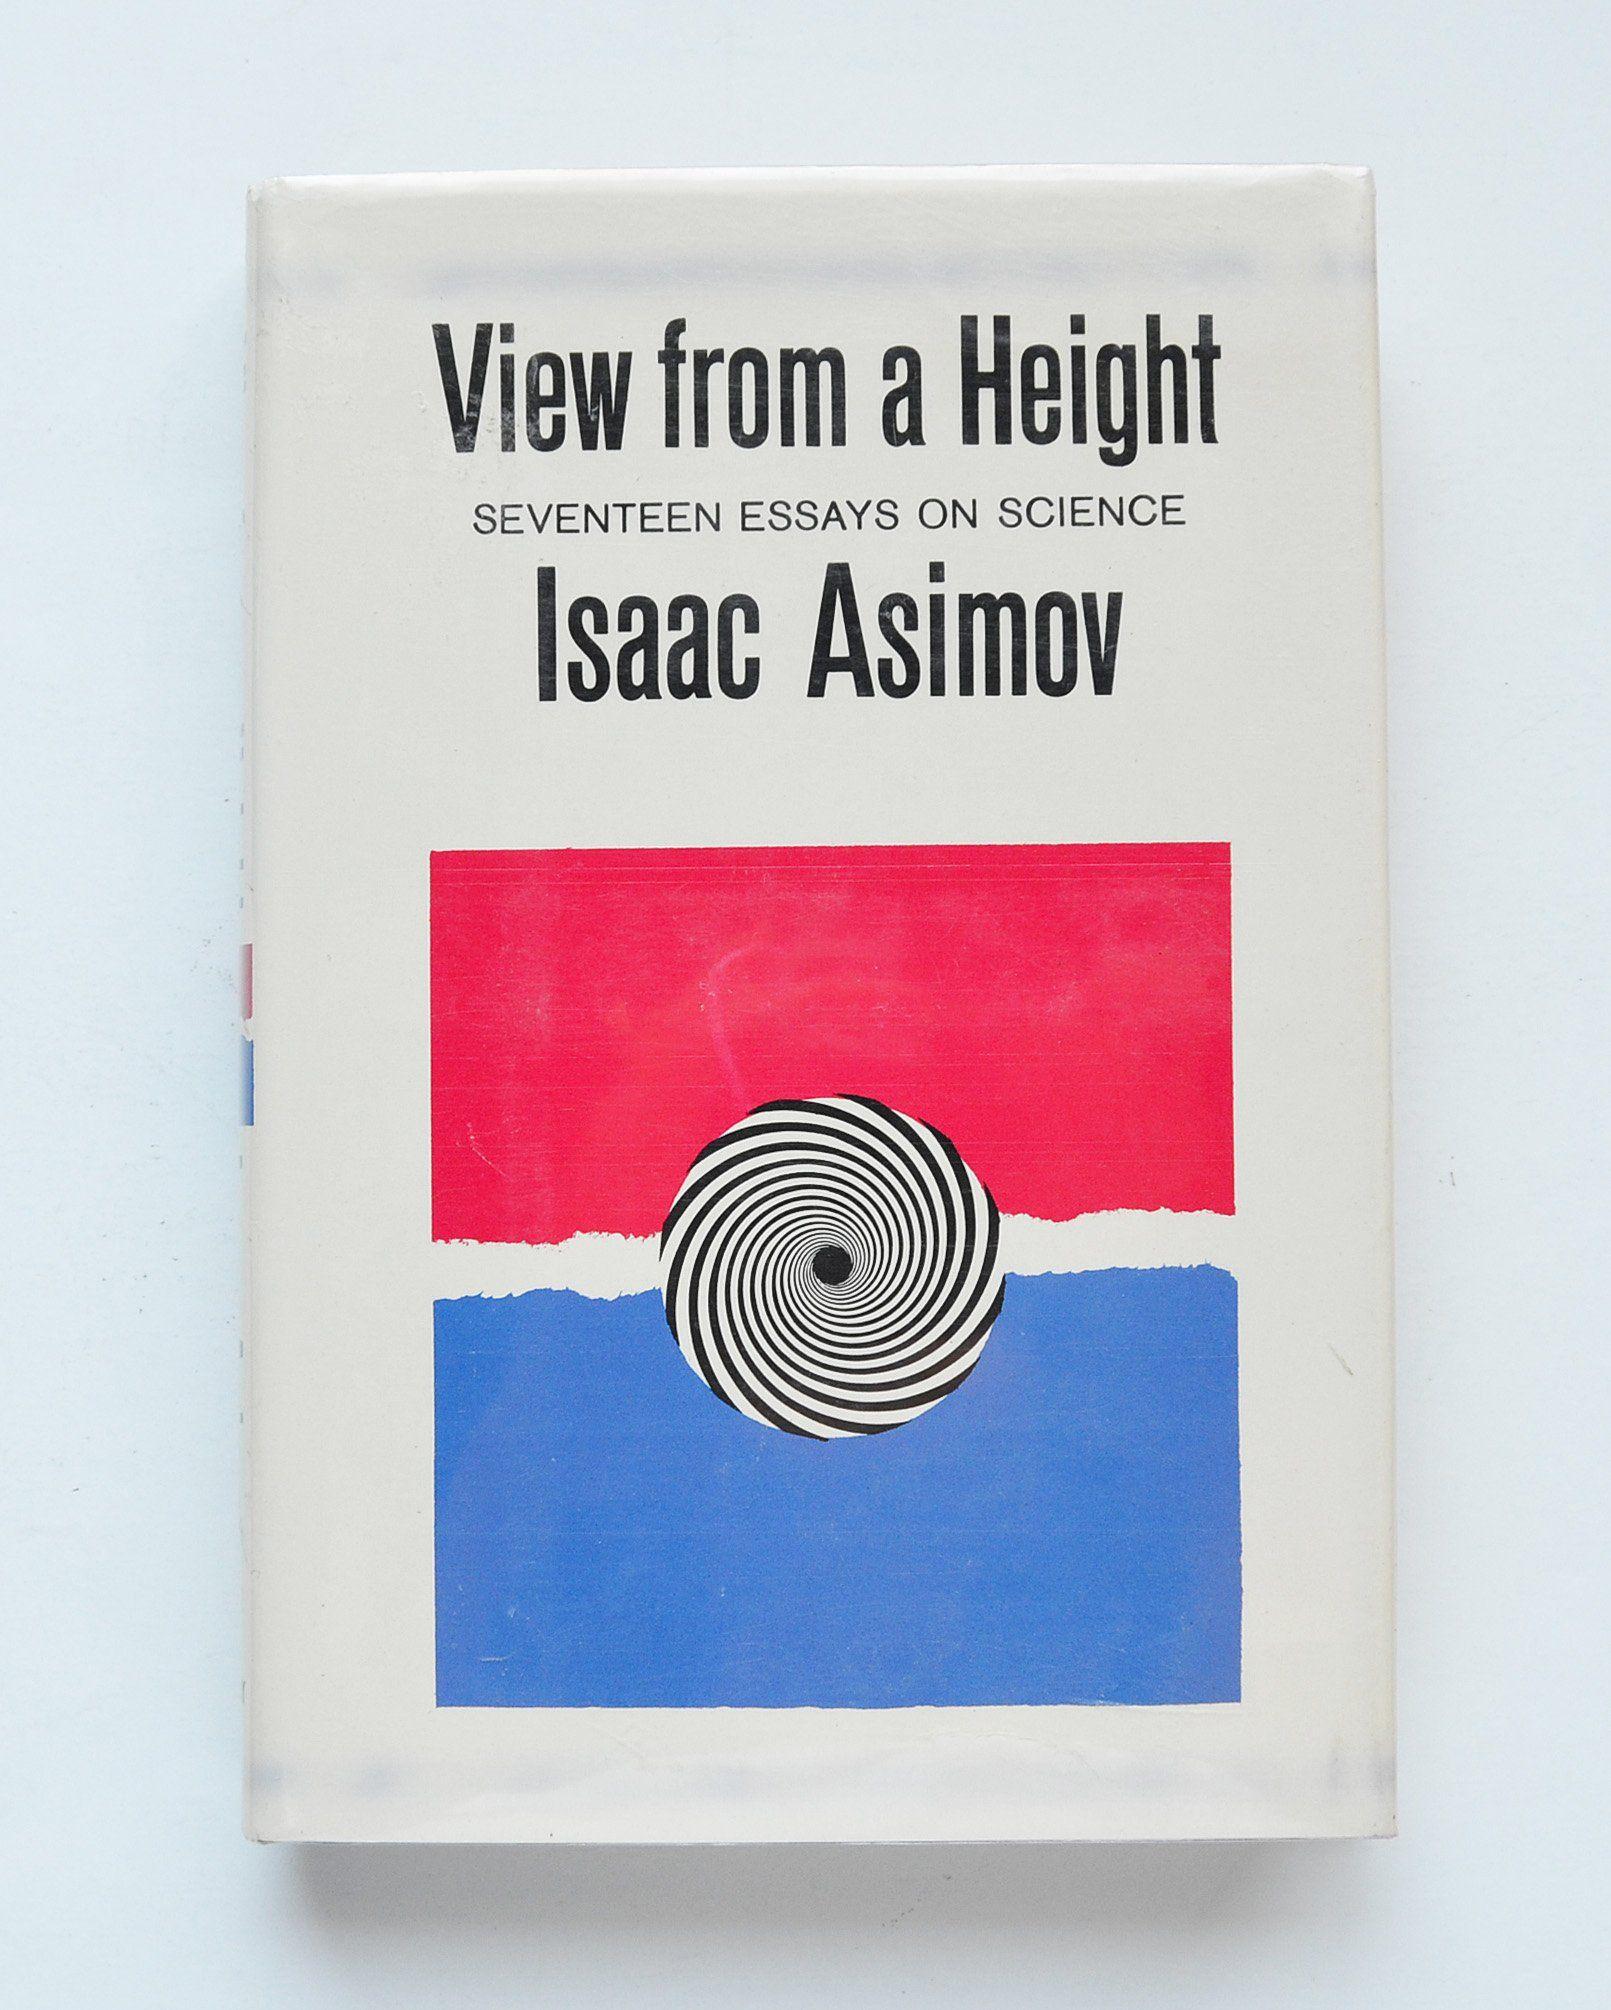 015 Isaac Asimov Essays Essay Awful On Creativity Intelligence Full